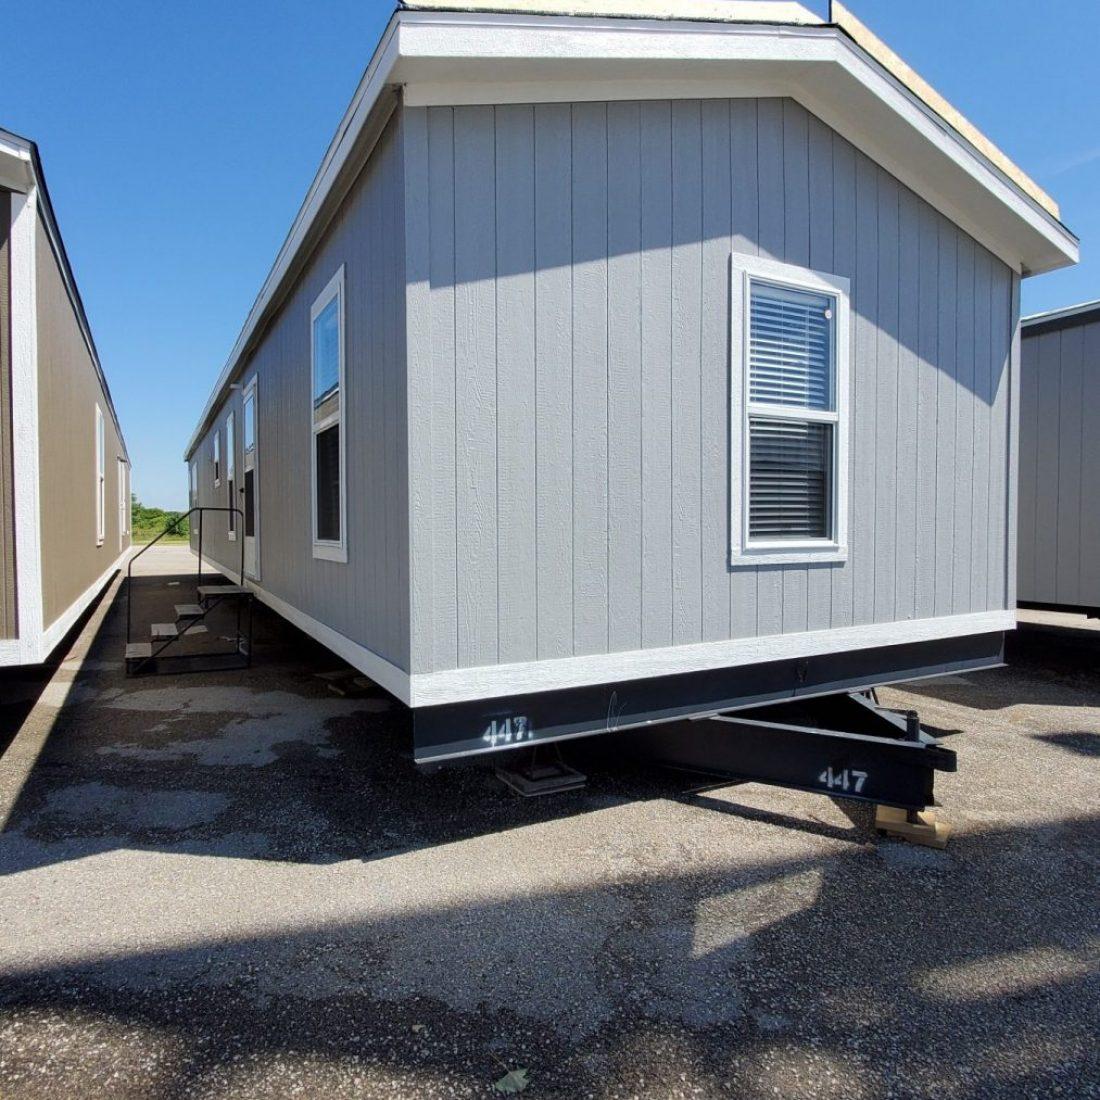 New Vision Rossman Nunn Homes Manufactured Homes